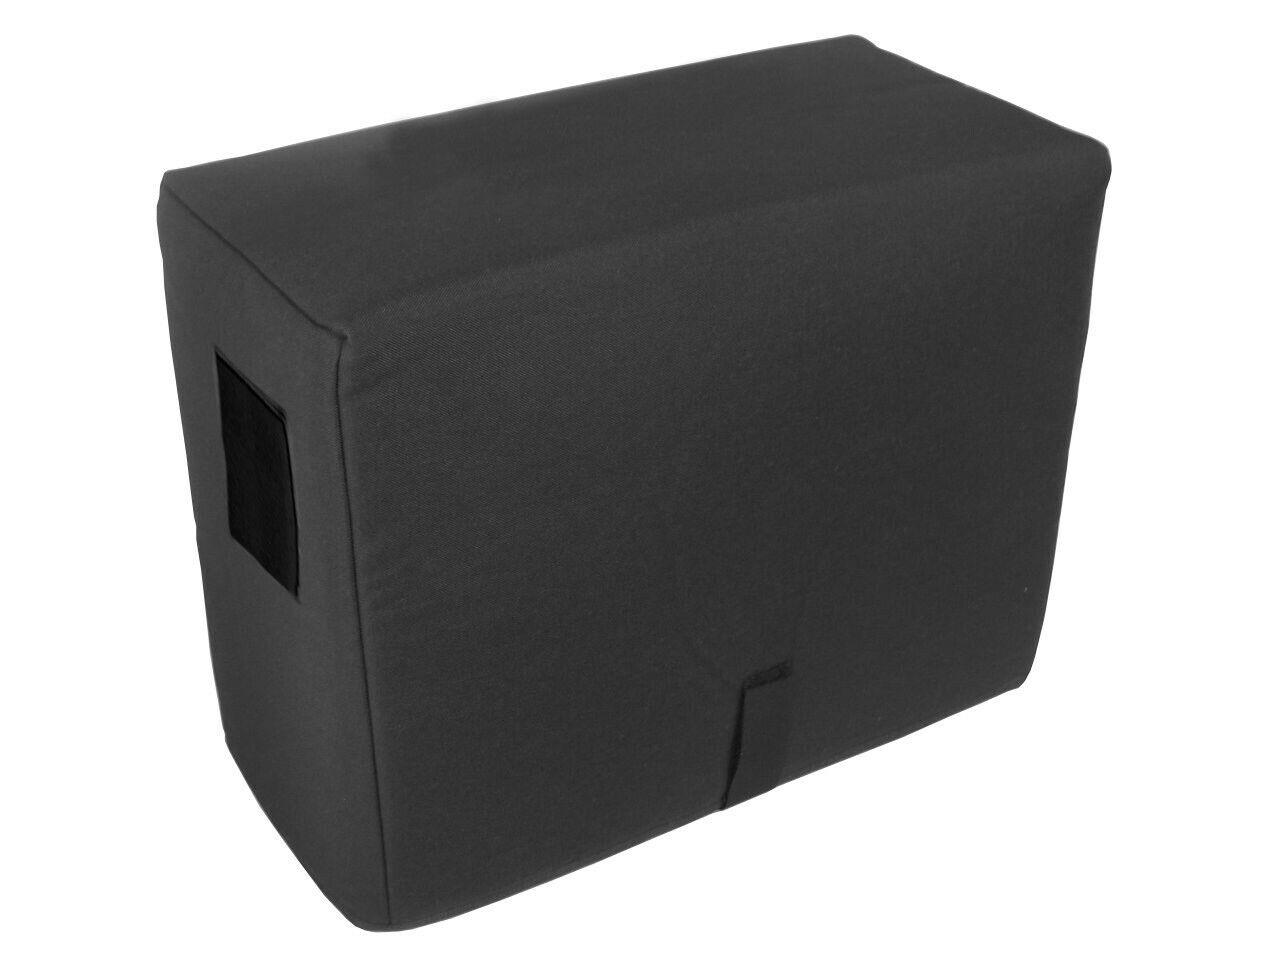 Bergantino AE-210 Cabinet Cover 22 3 4 W x 17 3 4 H x 12 1 2 D (berg014p)